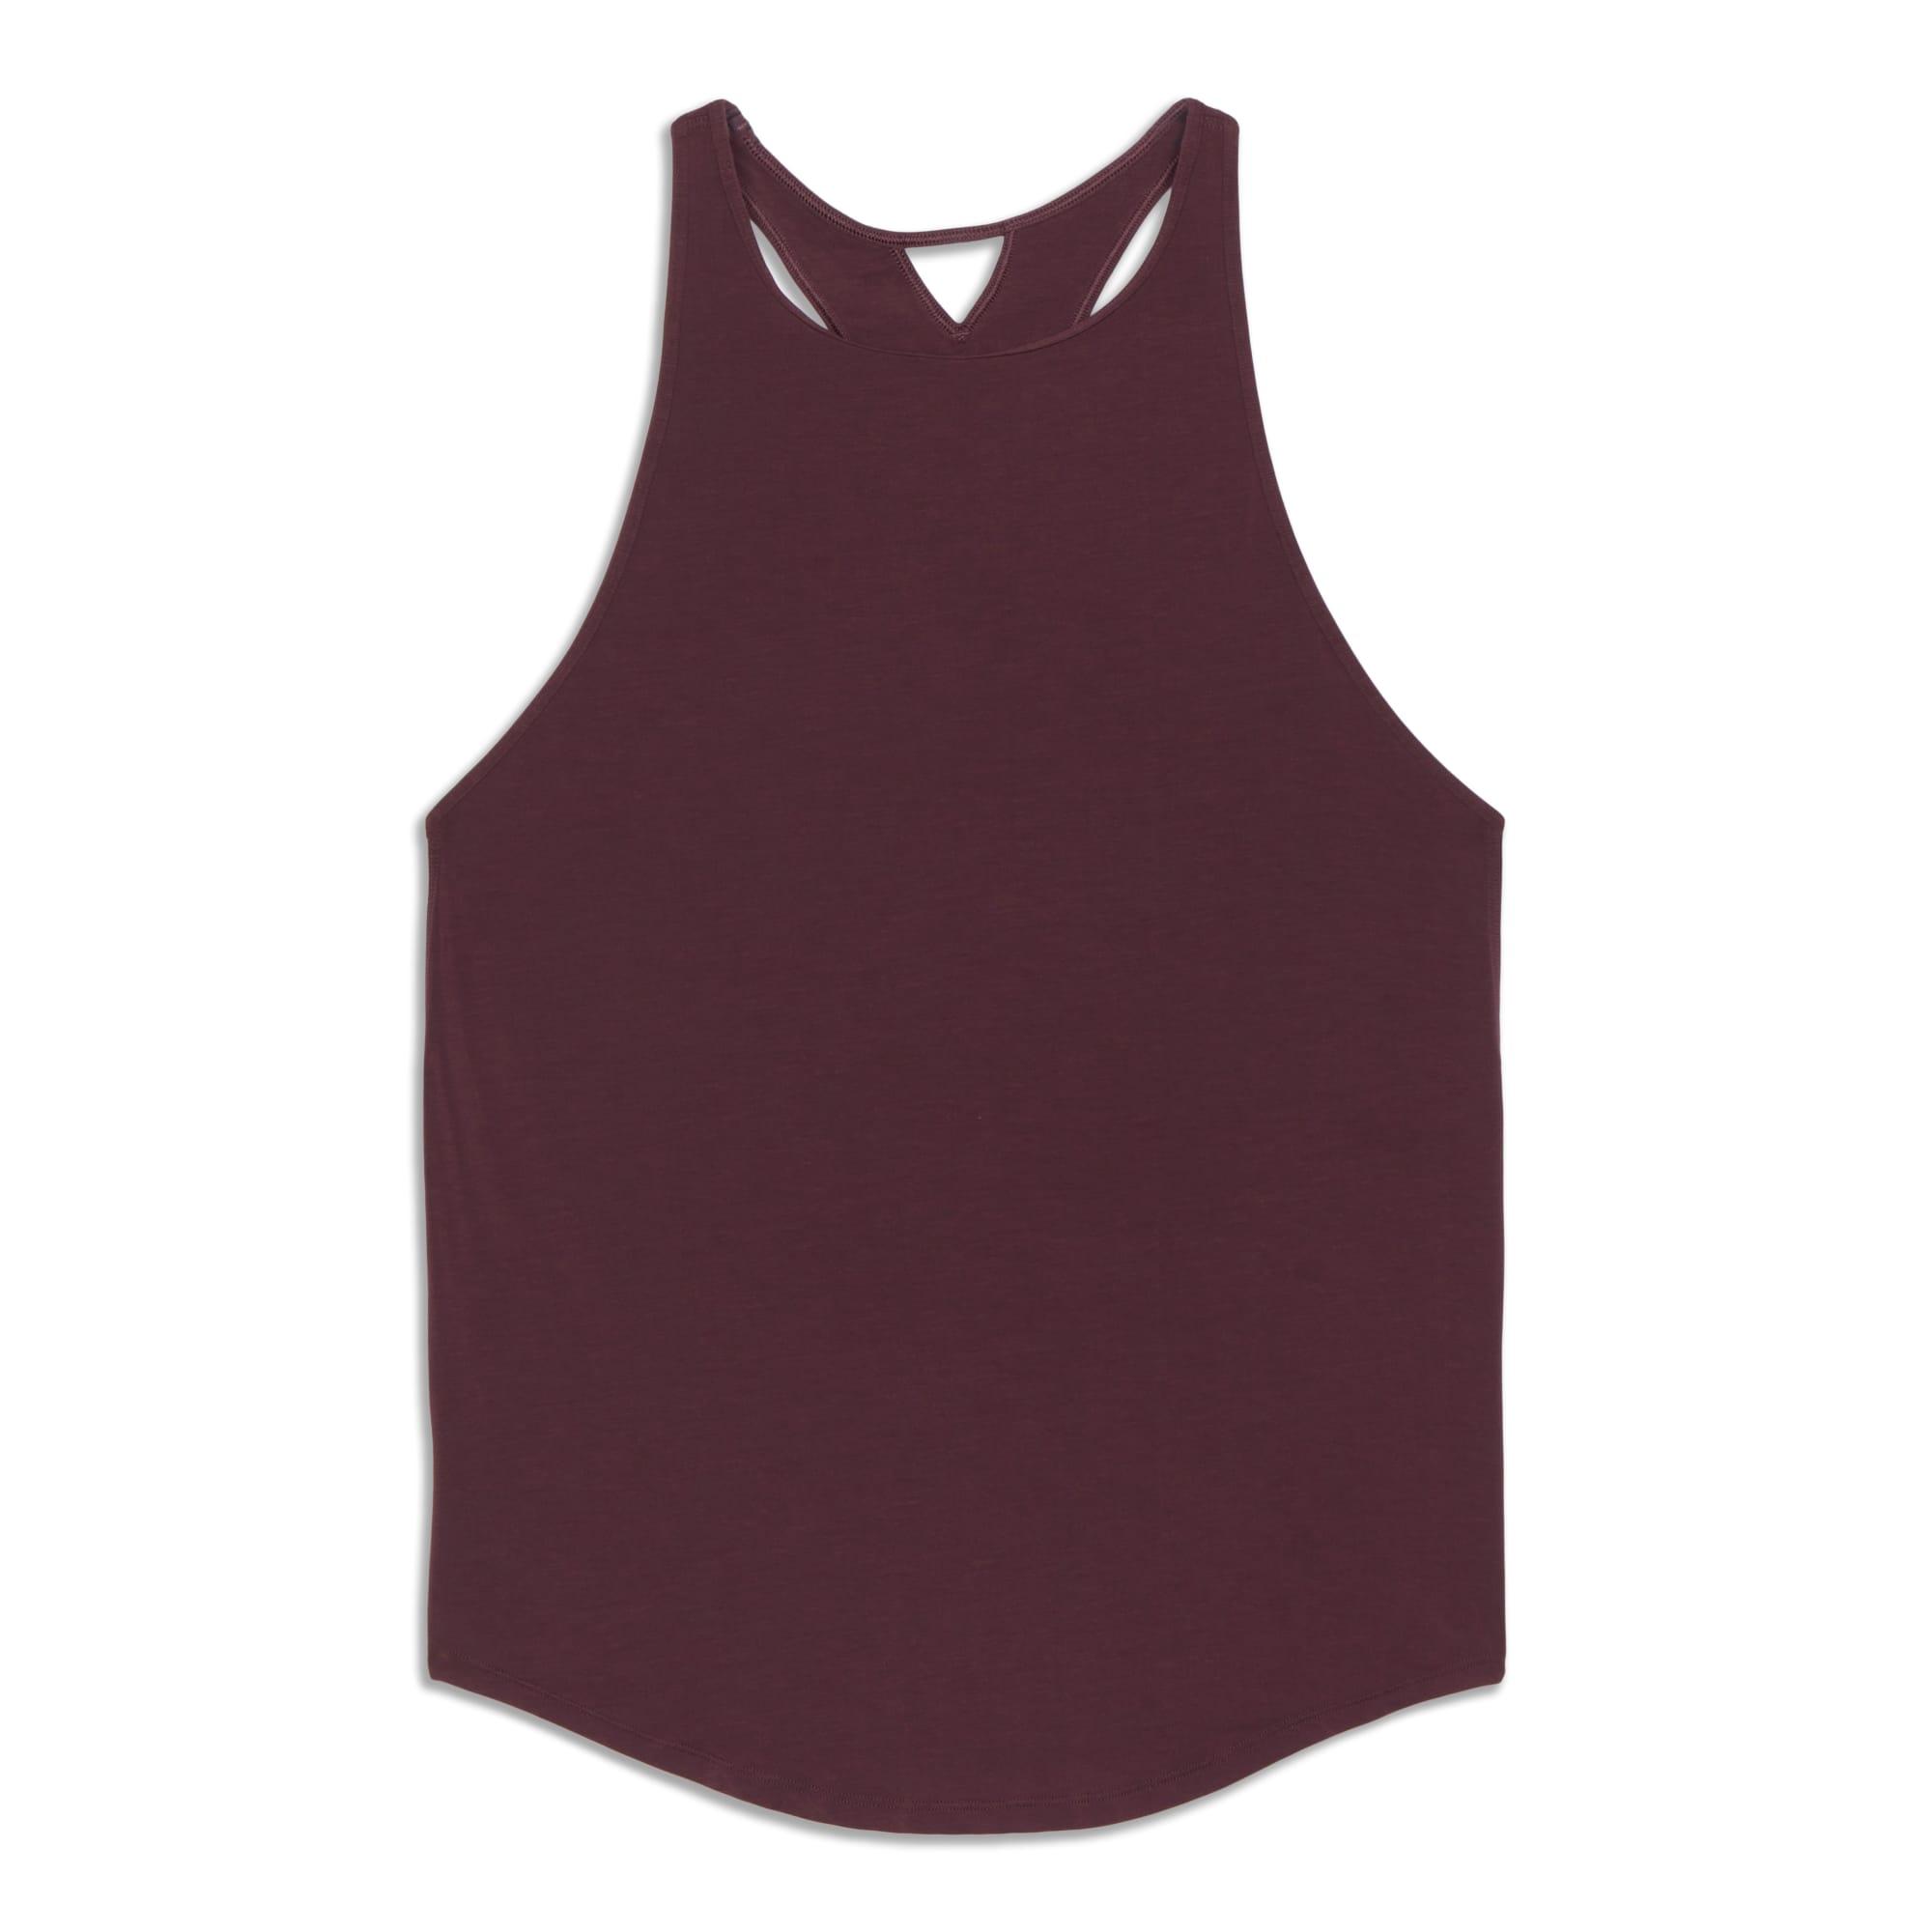 Main product image: Women's Racerback Shirt - Resale